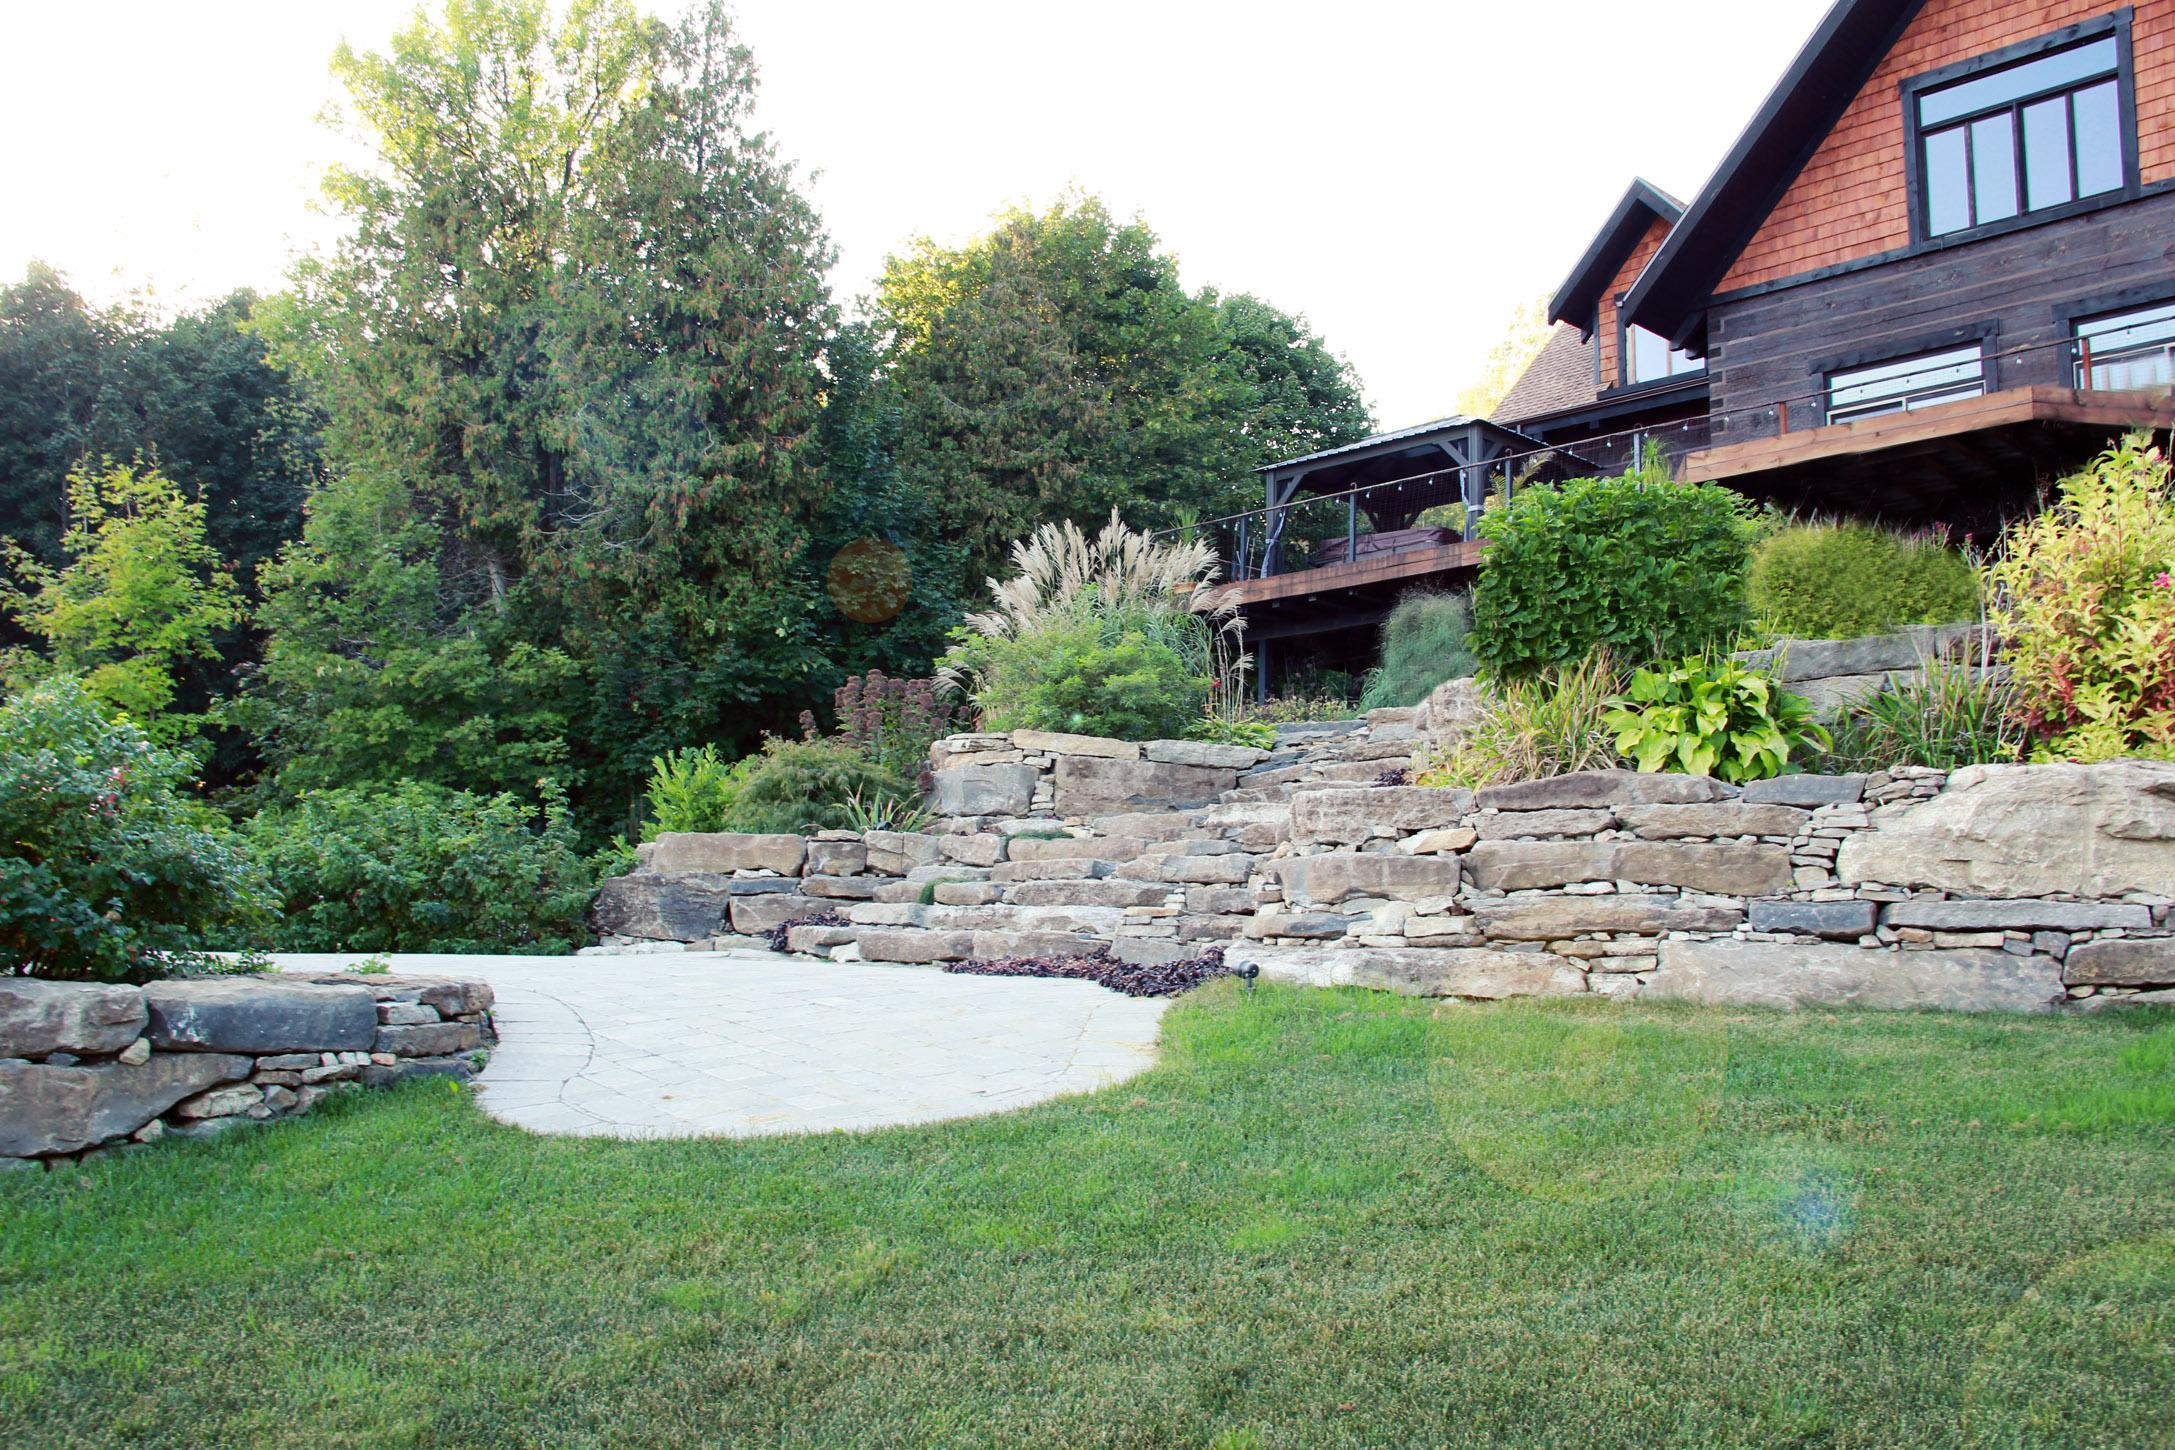 Riverview Landscape_Landscape Architect_Brockville_1000 Islands.jpg